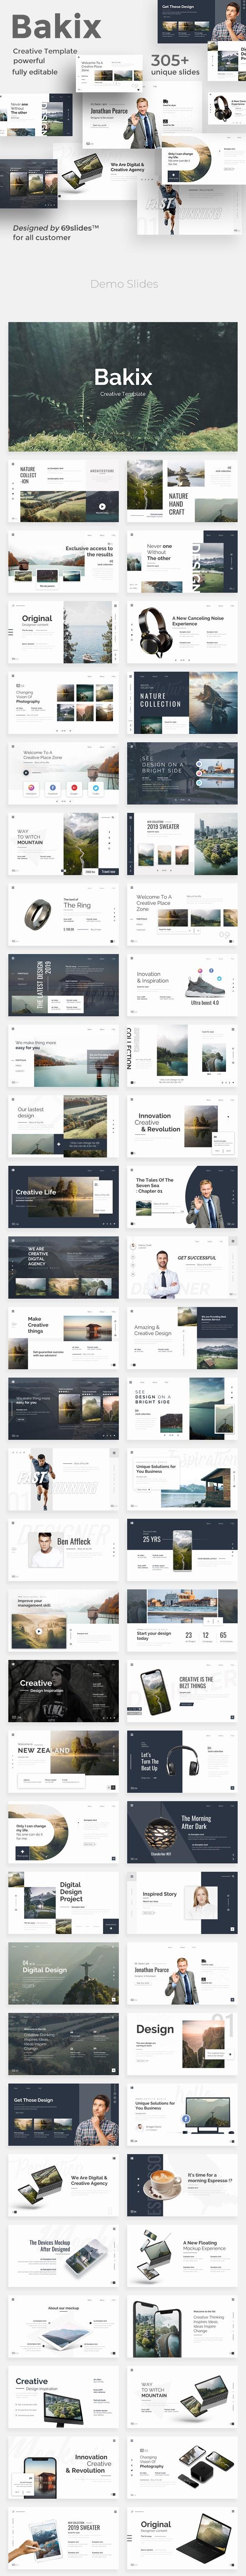 Bakix Premium Powerpoint Template - Creative PowerPoint Templates